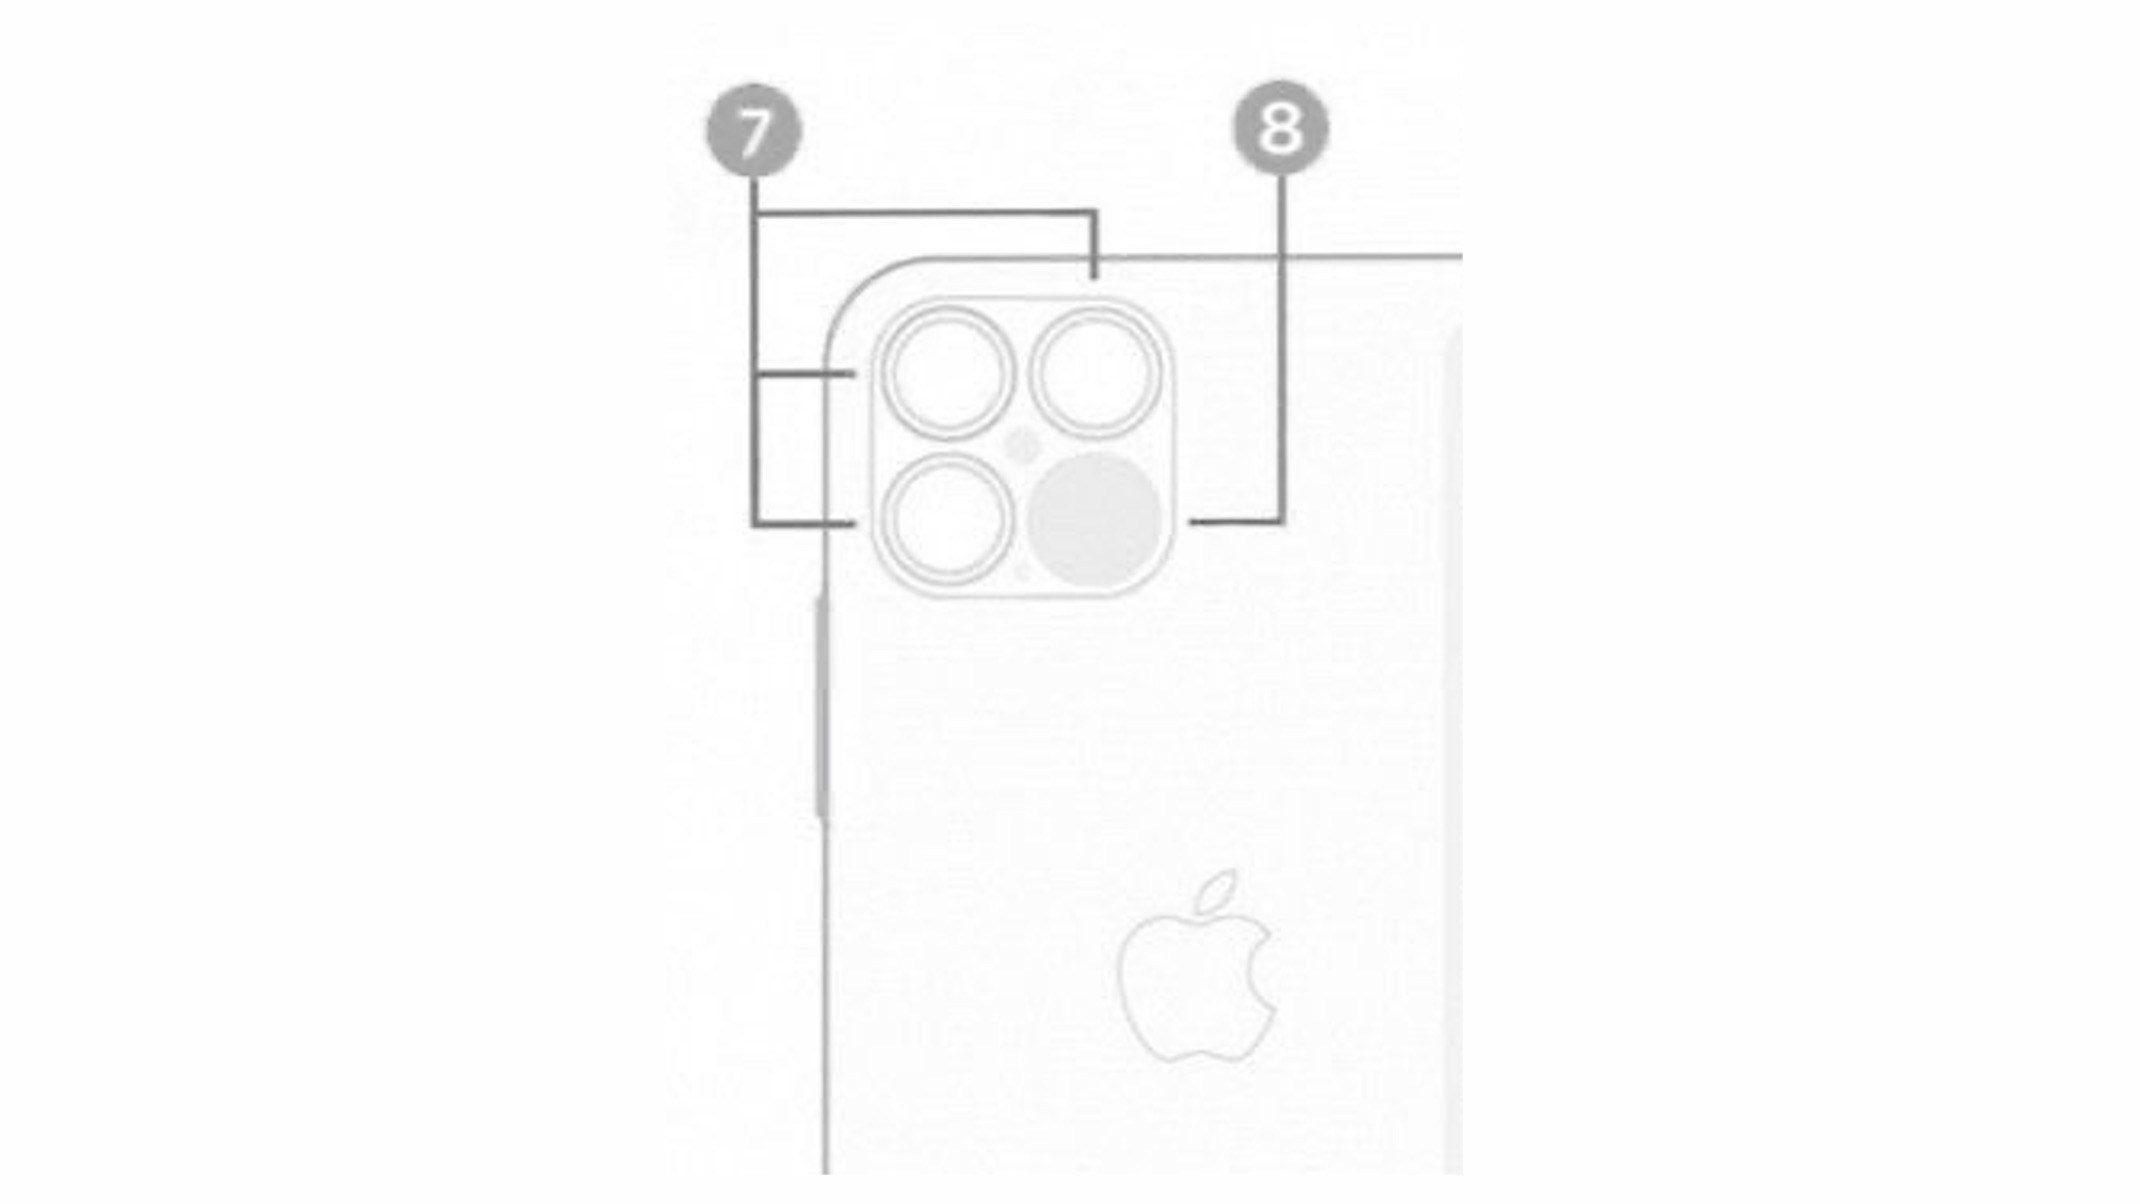 Lidar Scanner and a Tripple Lens Camera